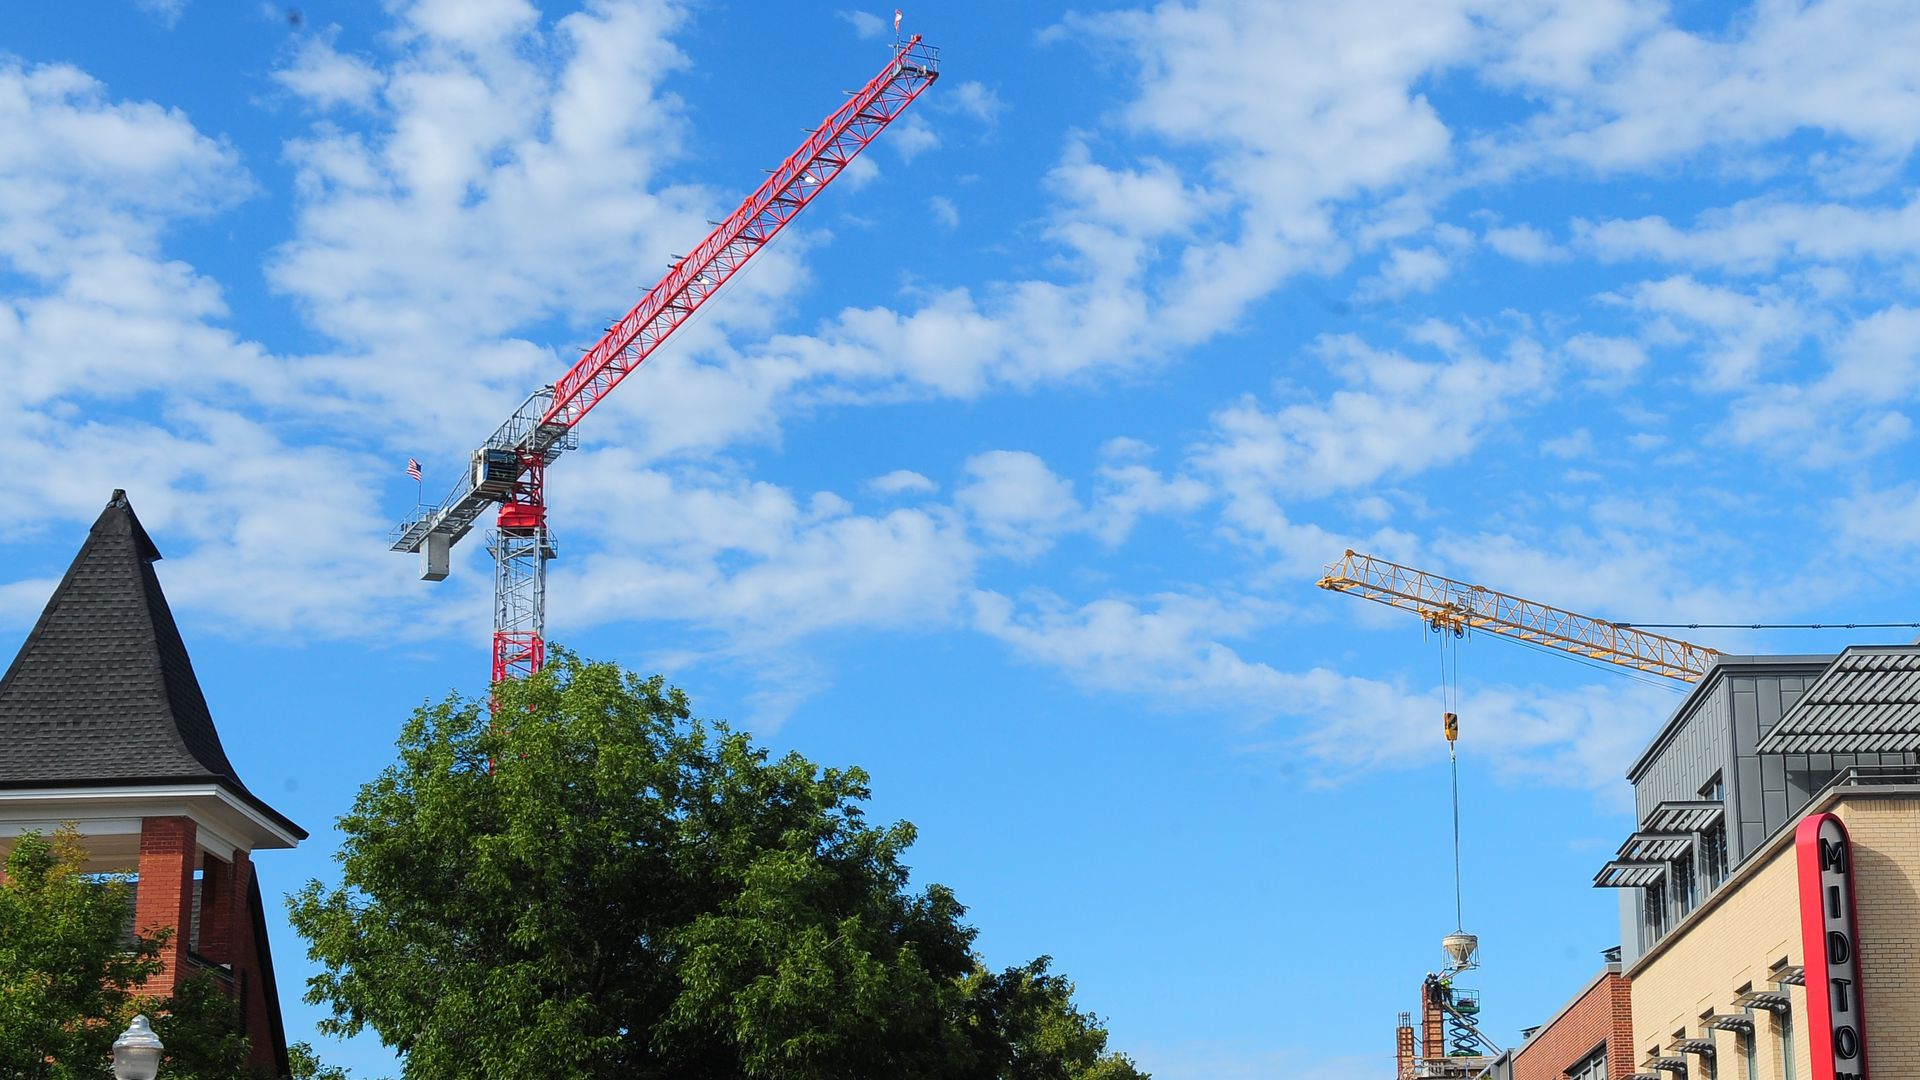 Construction cranes over downtown Bentonville.